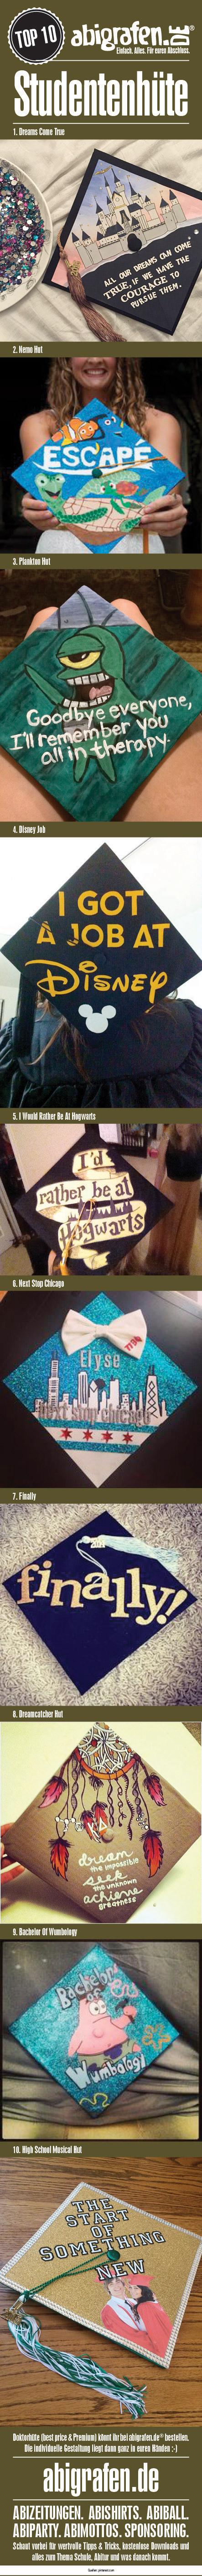 #doktorhüte #studentenhüte #college #caps #Schülerhut #Graduation #Cap #Senior #Cap #Abschlusshut #Hut #Abitur